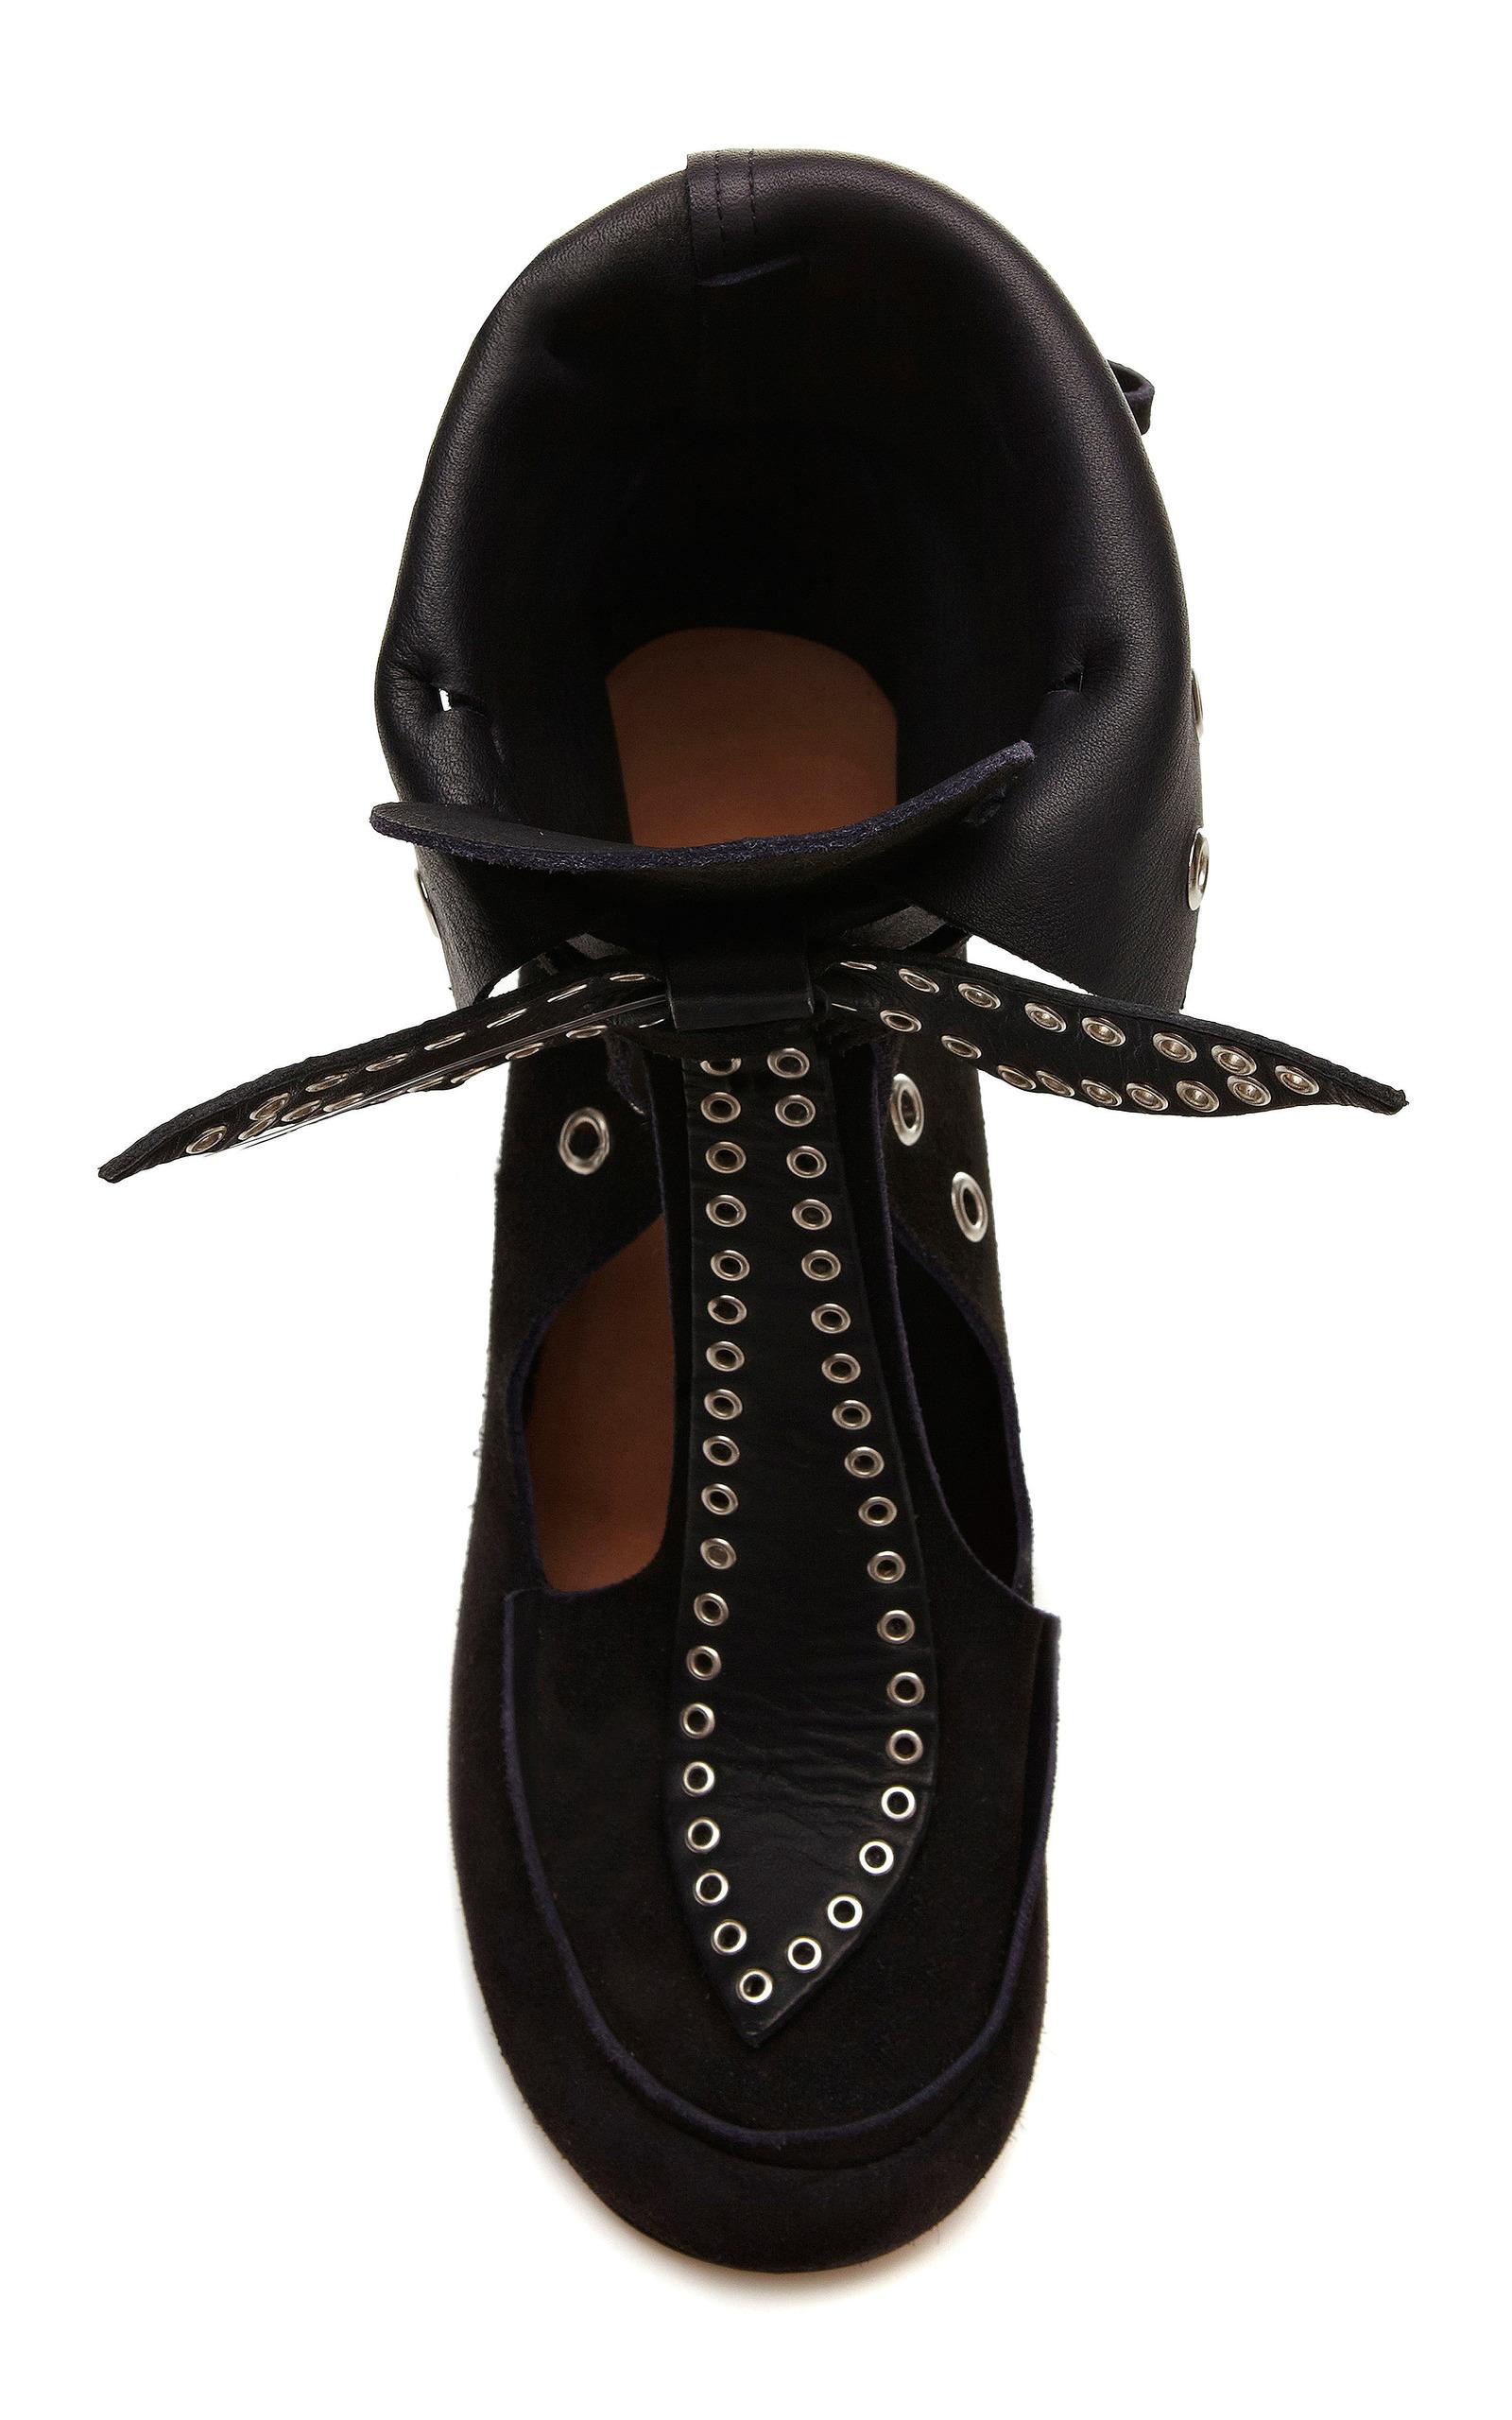 5a98928e196 Isabel MarantMilla Bow Tie Loafer Heel. CLOSE. Loading. Loading